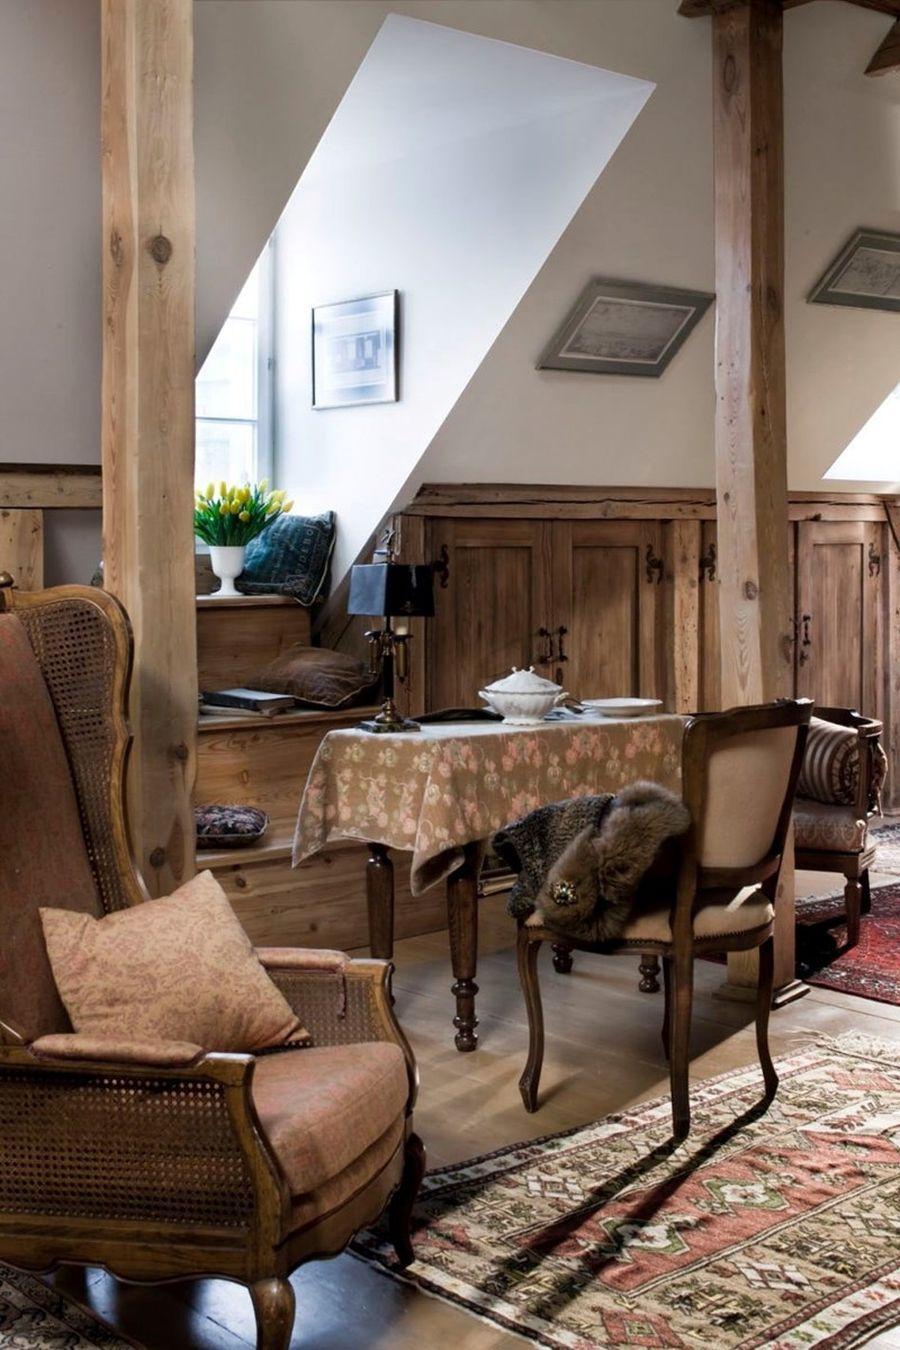 adelaparvu.com despre mansarda romantica, stil rustic, Design PrzepisnaDom, Foto Rafal Lipski (4)